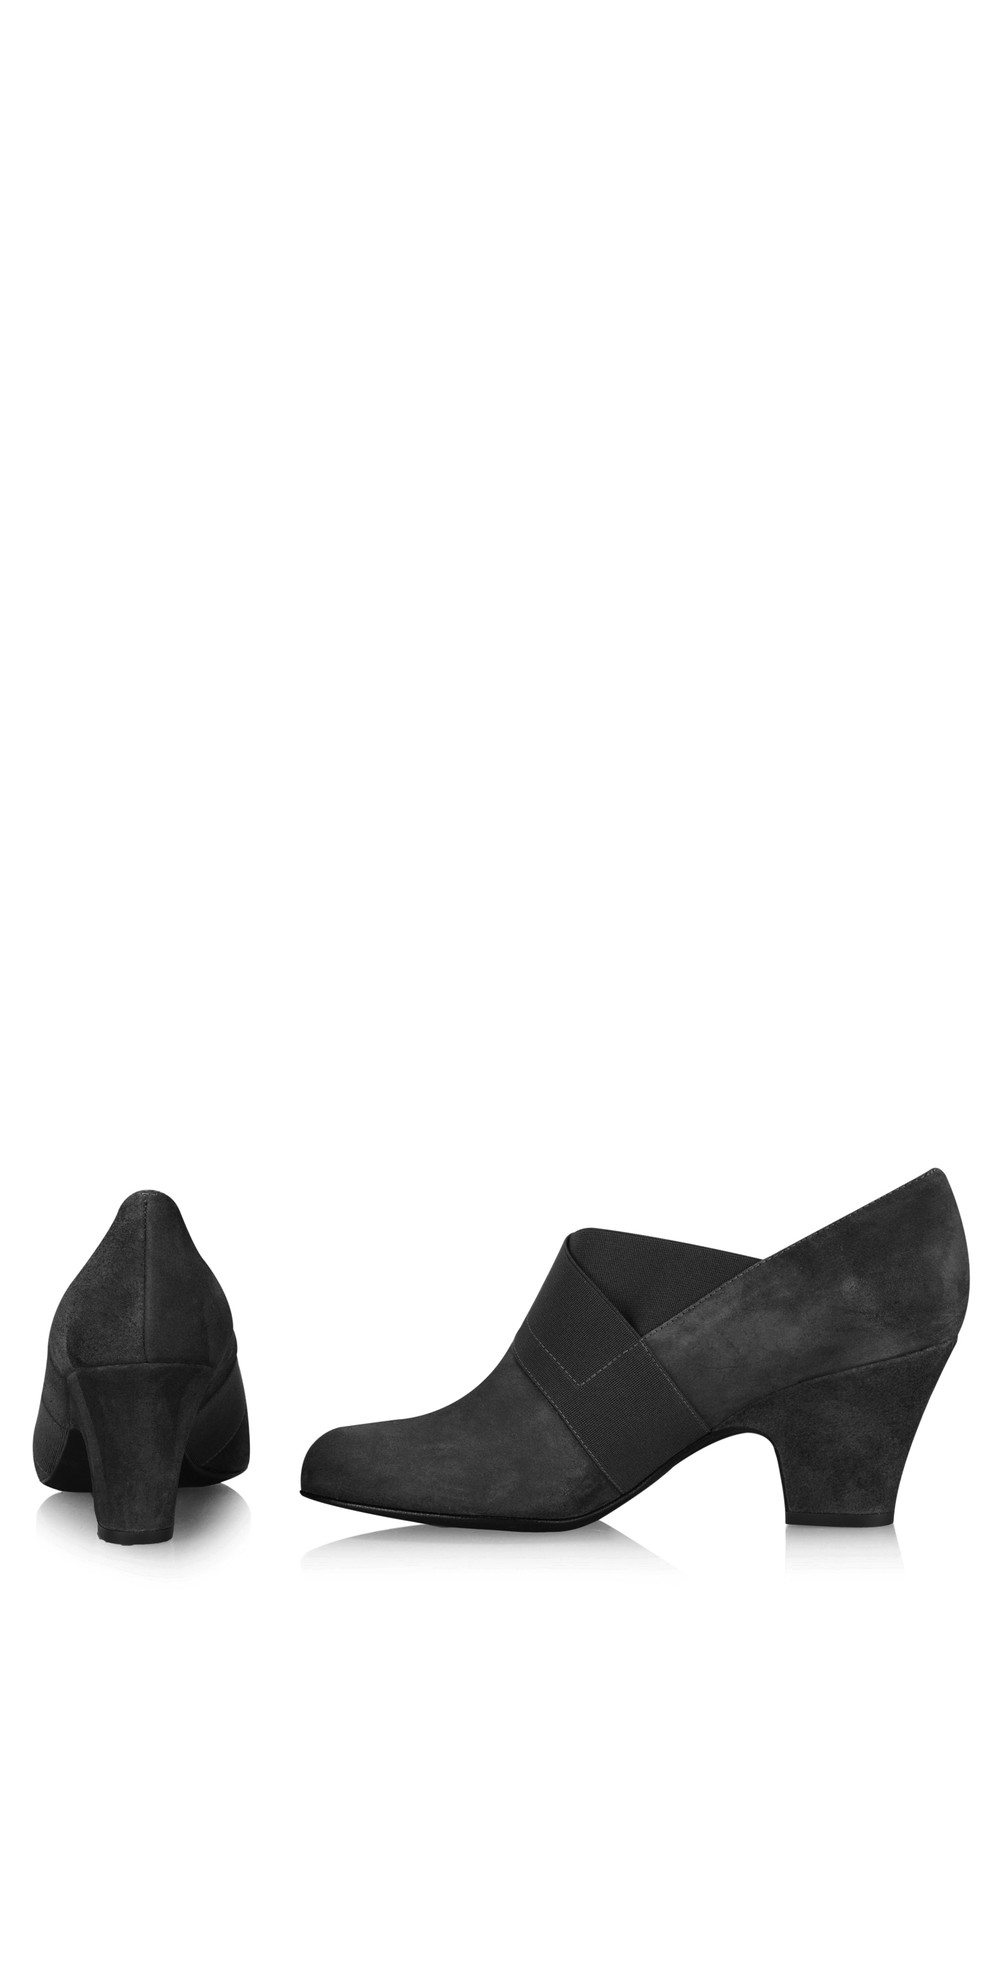 Bepra Black Suede Crossover Elastic Shoe main image